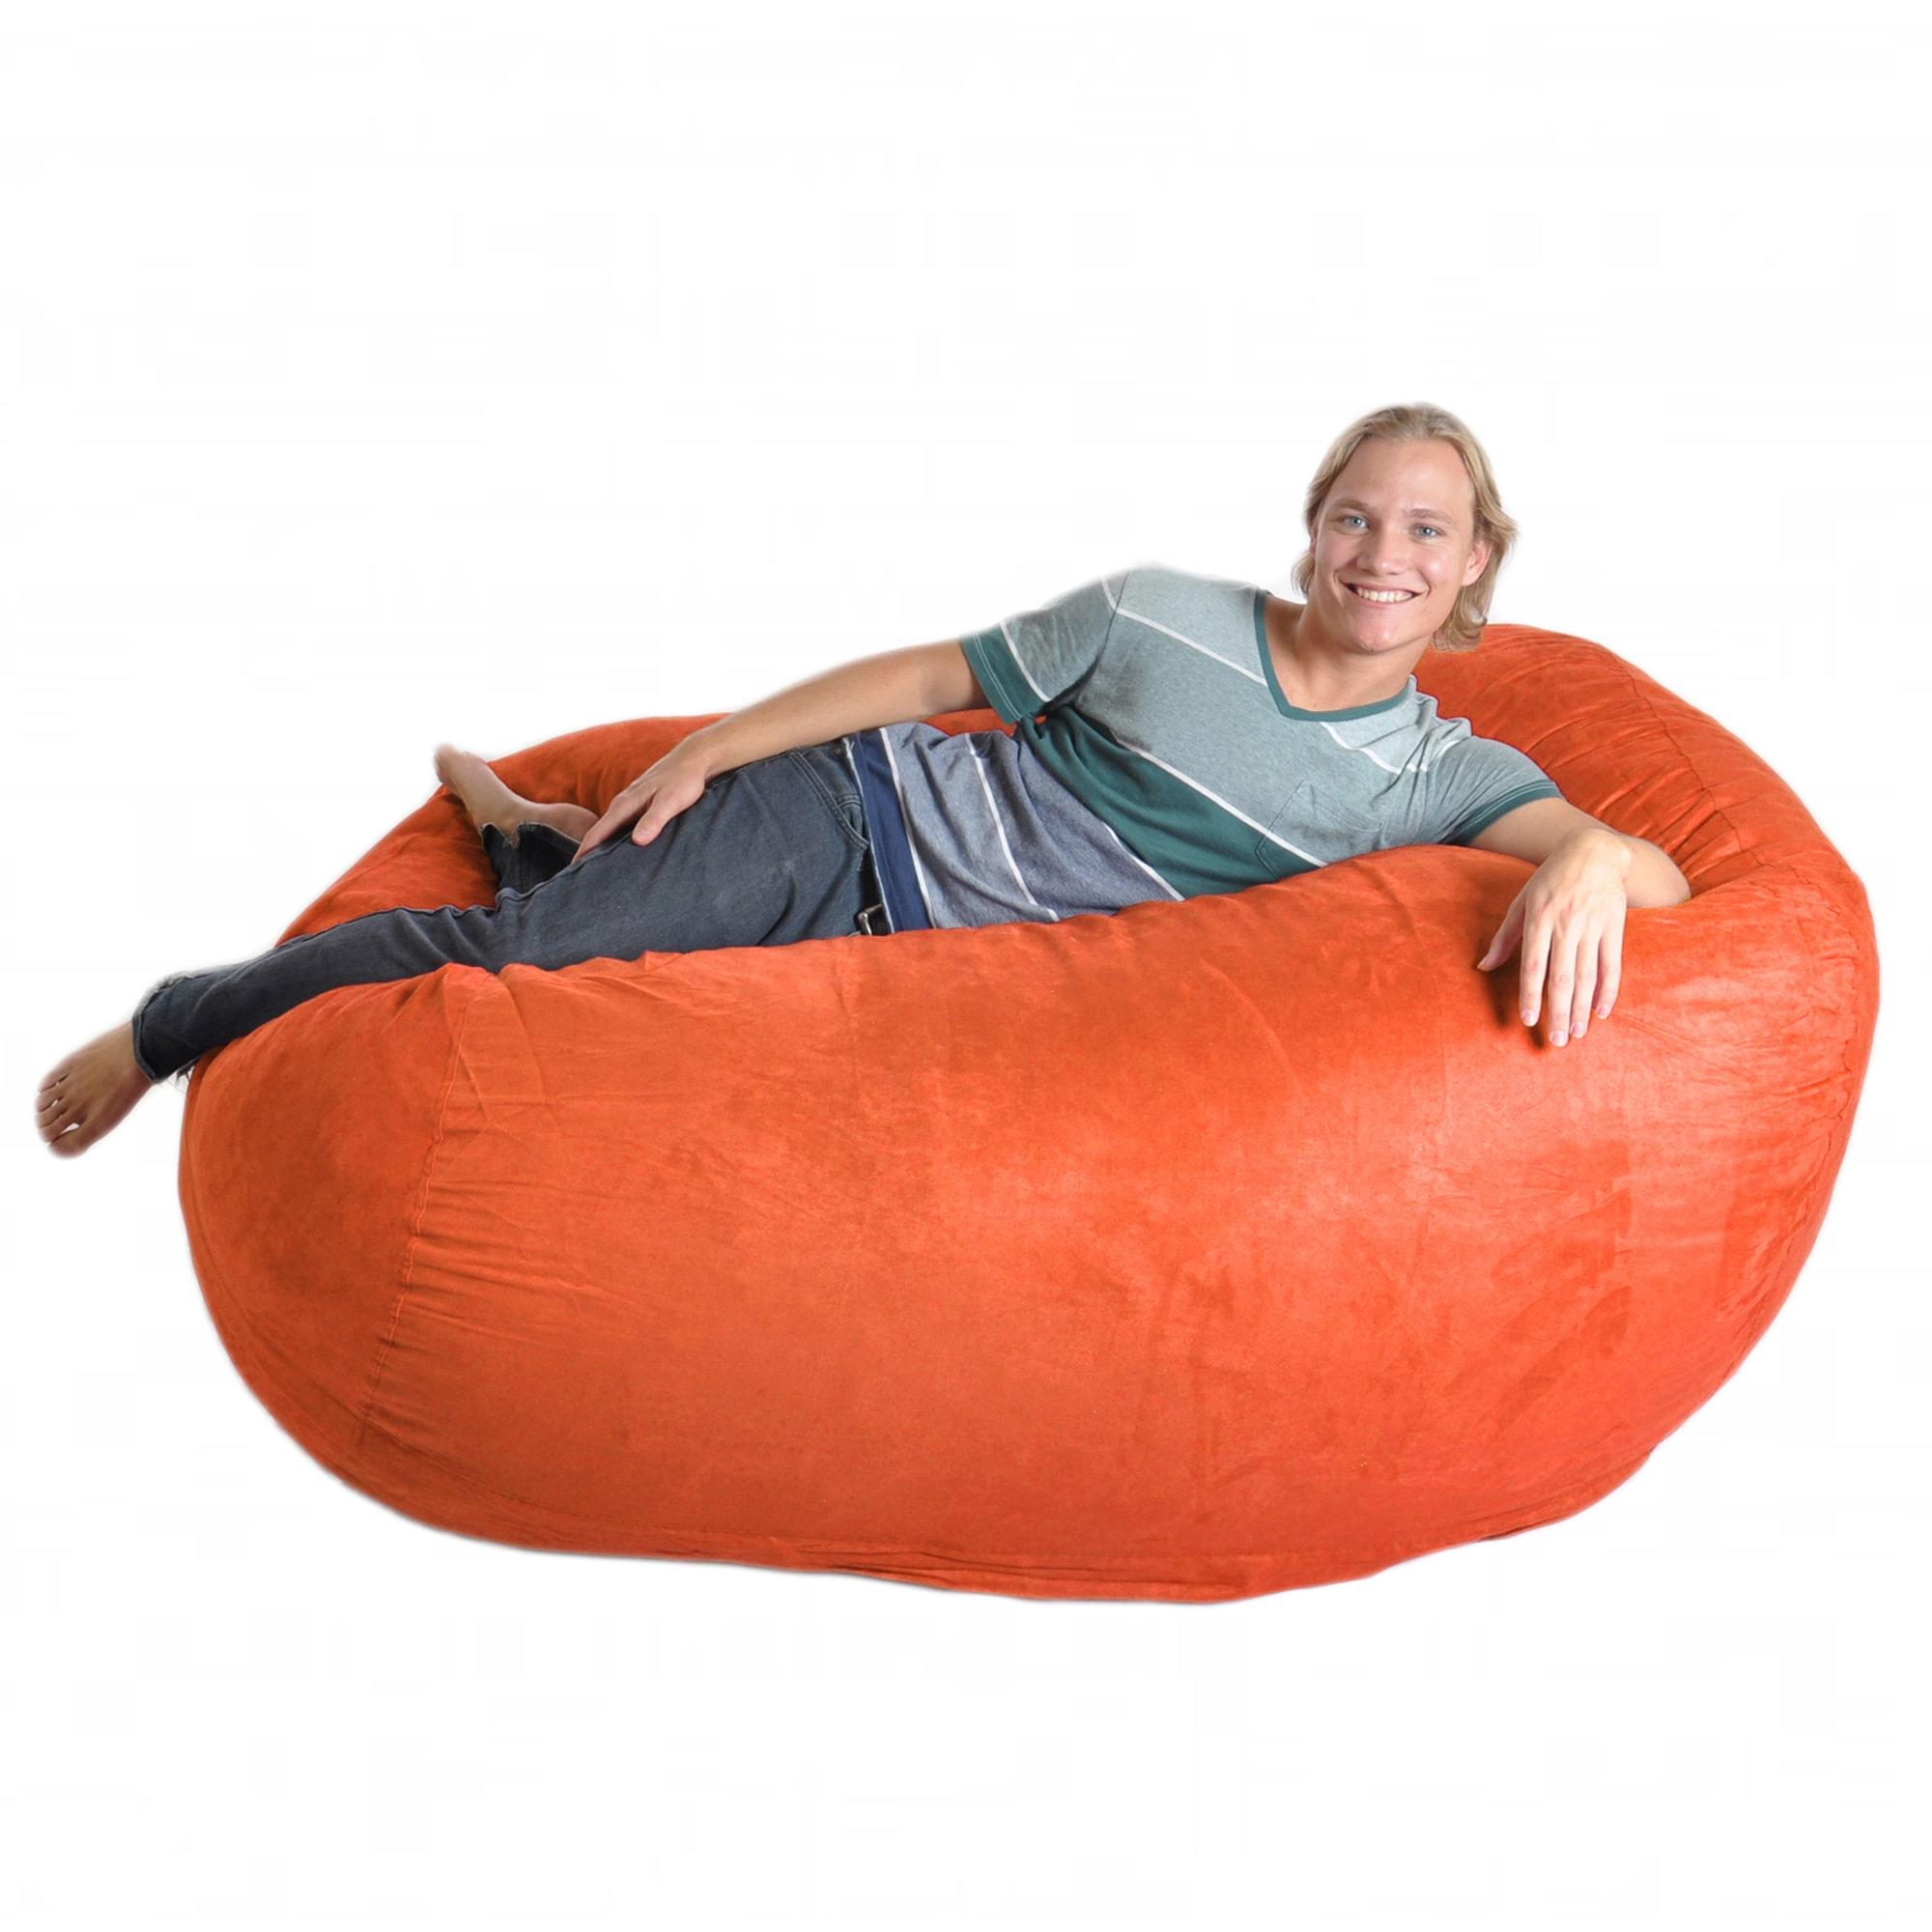 Slacker Sack Six-foot Pumpkin Oval Microfiber/ Foam Bean Bag